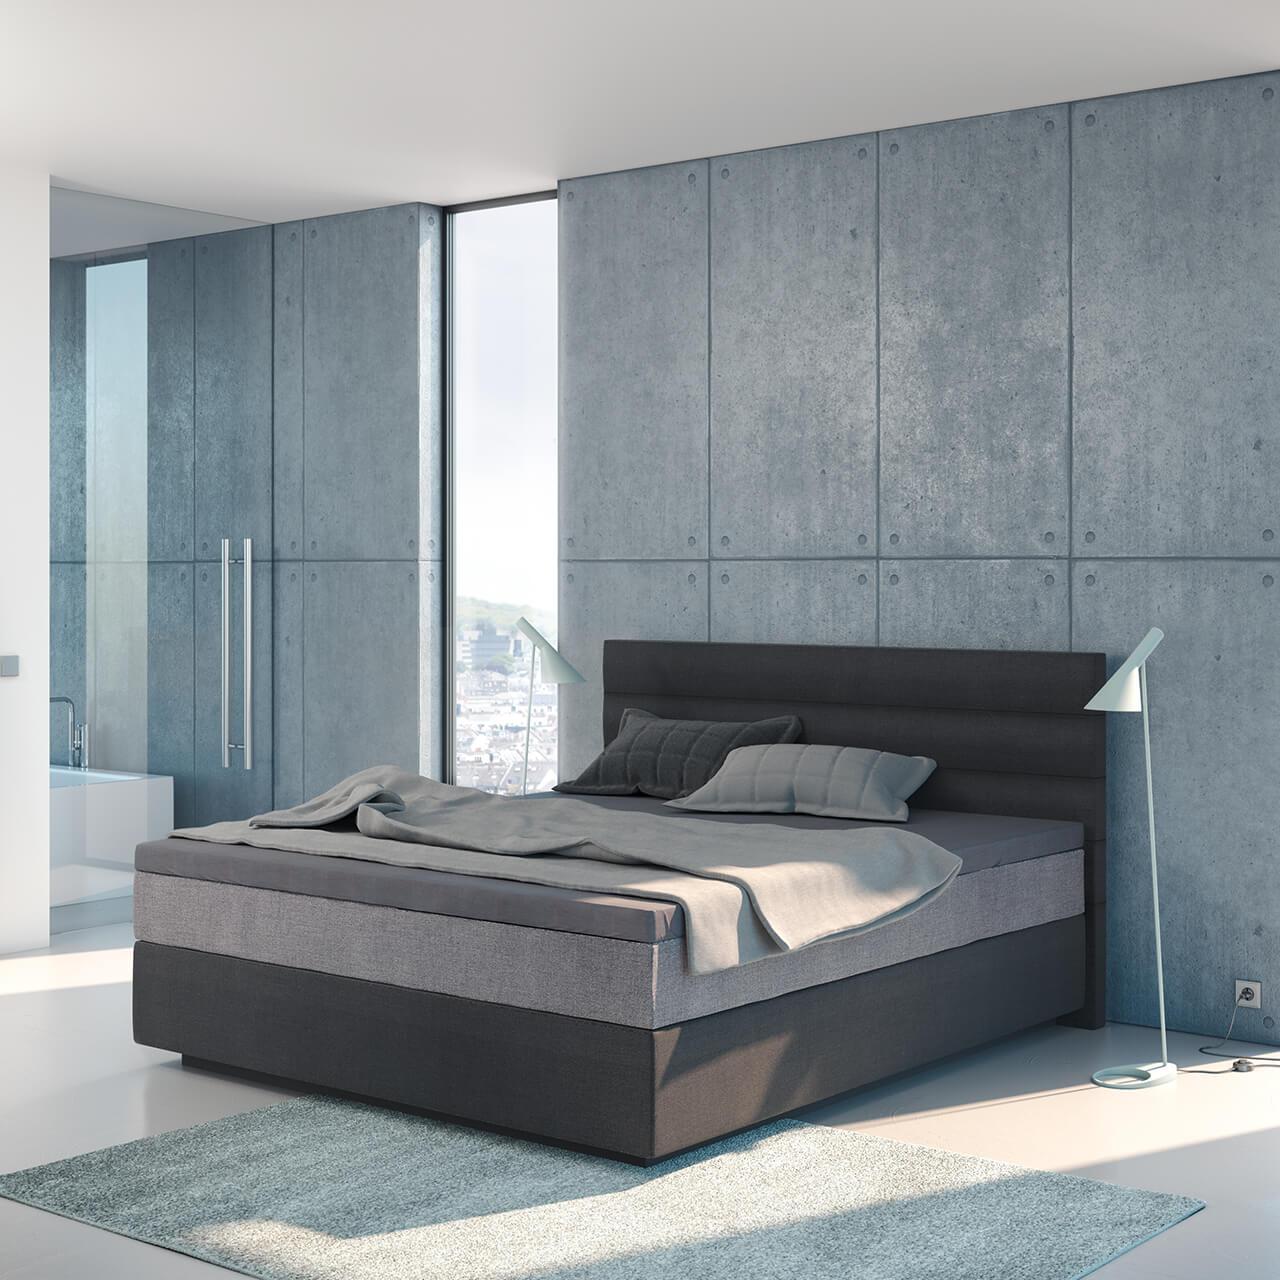 wasserbett inklusive suma boxspring classic wandpaneel largo topper laken set 54 suma. Black Bedroom Furniture Sets. Home Design Ideas